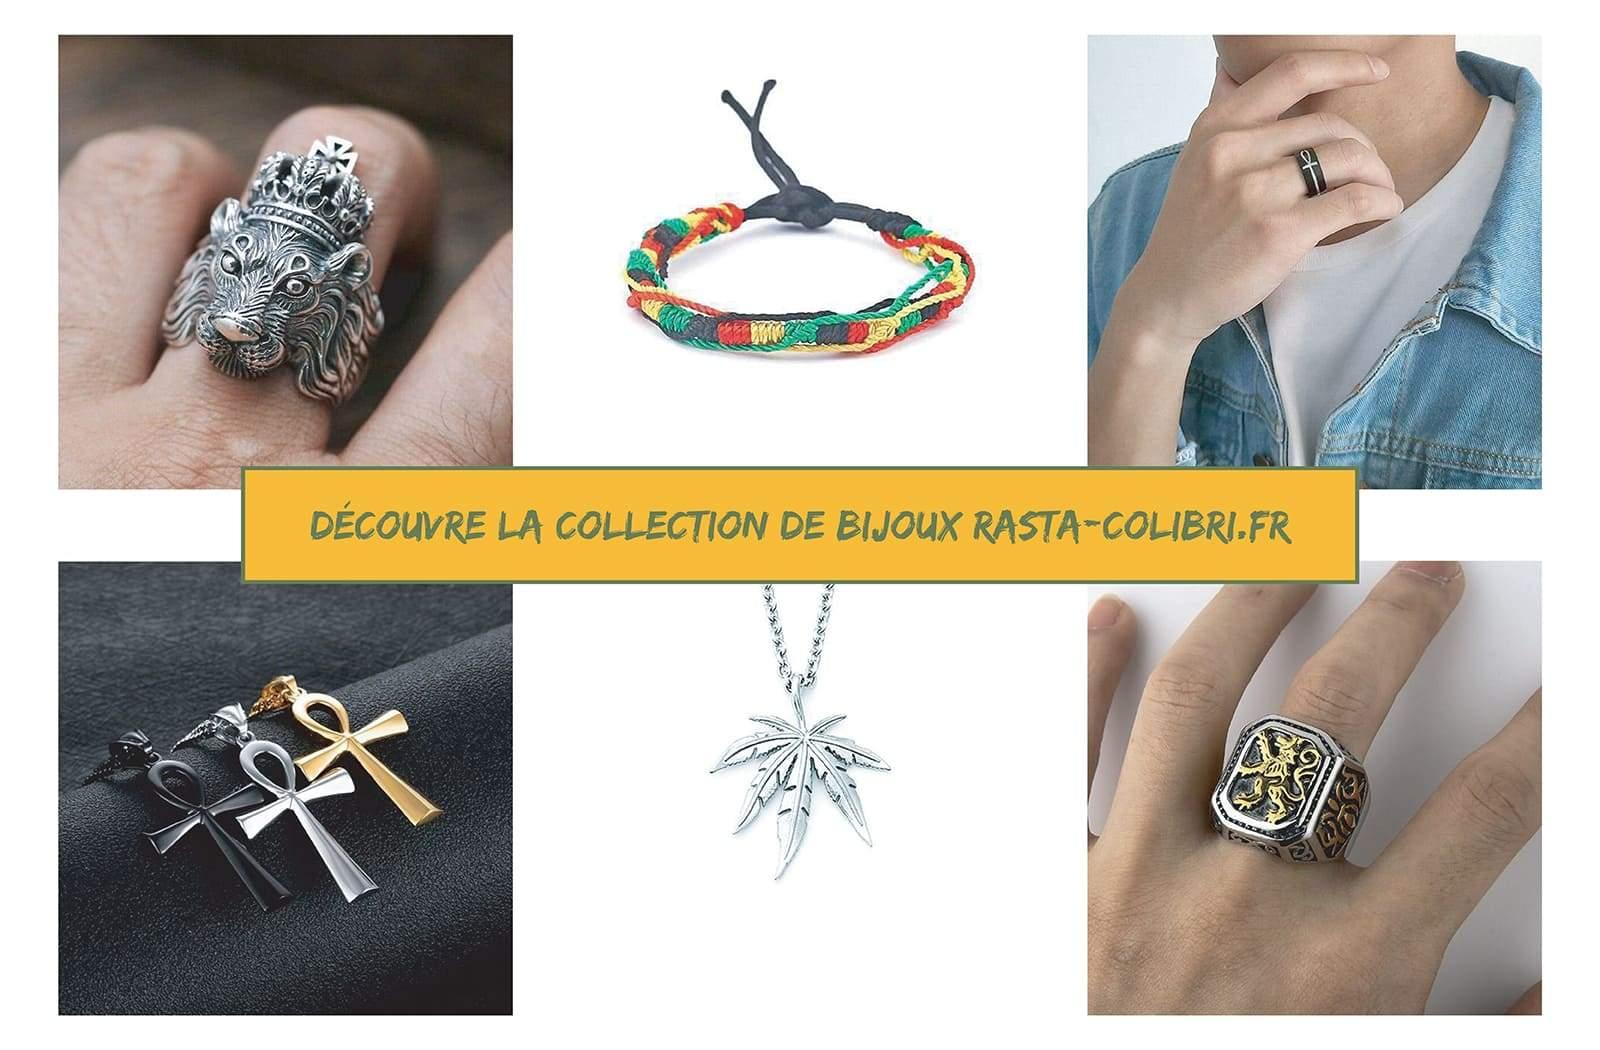 Collection de bijoux rastas